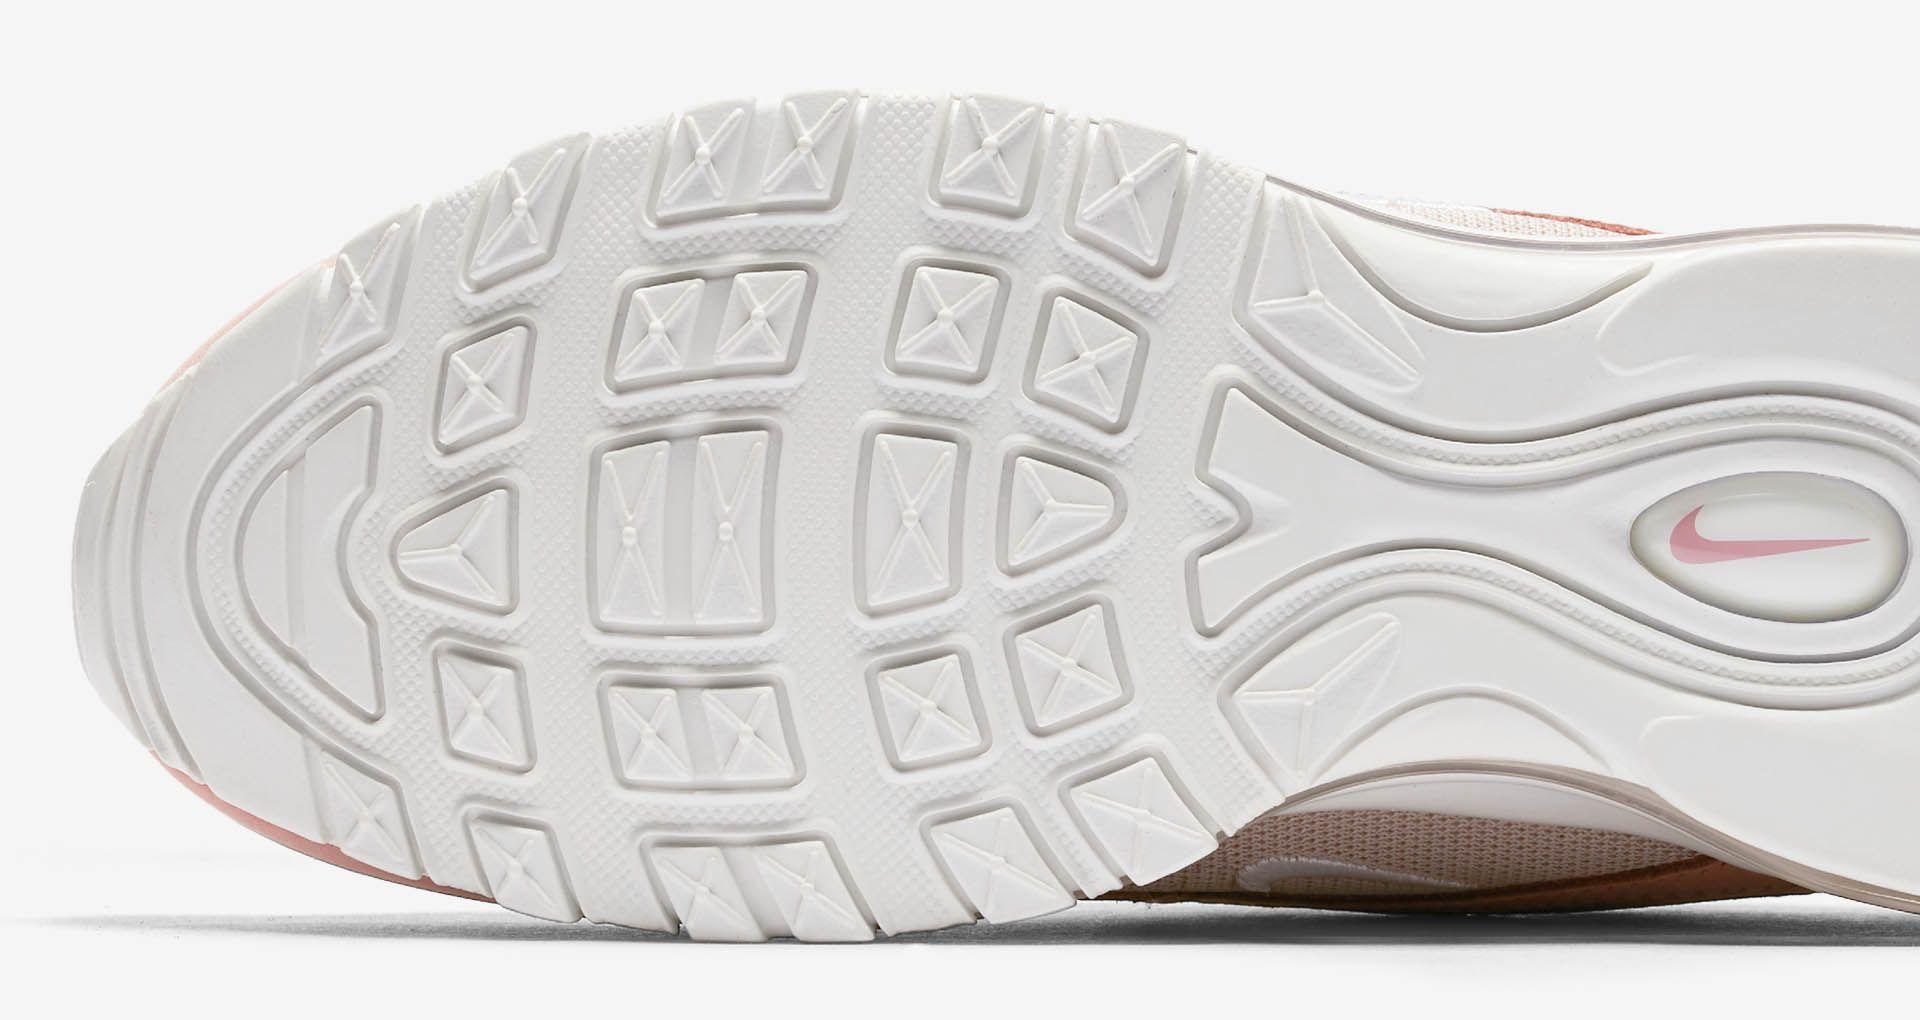 brand new ae684 379f1 Nike 97 Air Max Beige  Nike Date Premium Release  Particle qzExdd8Cw